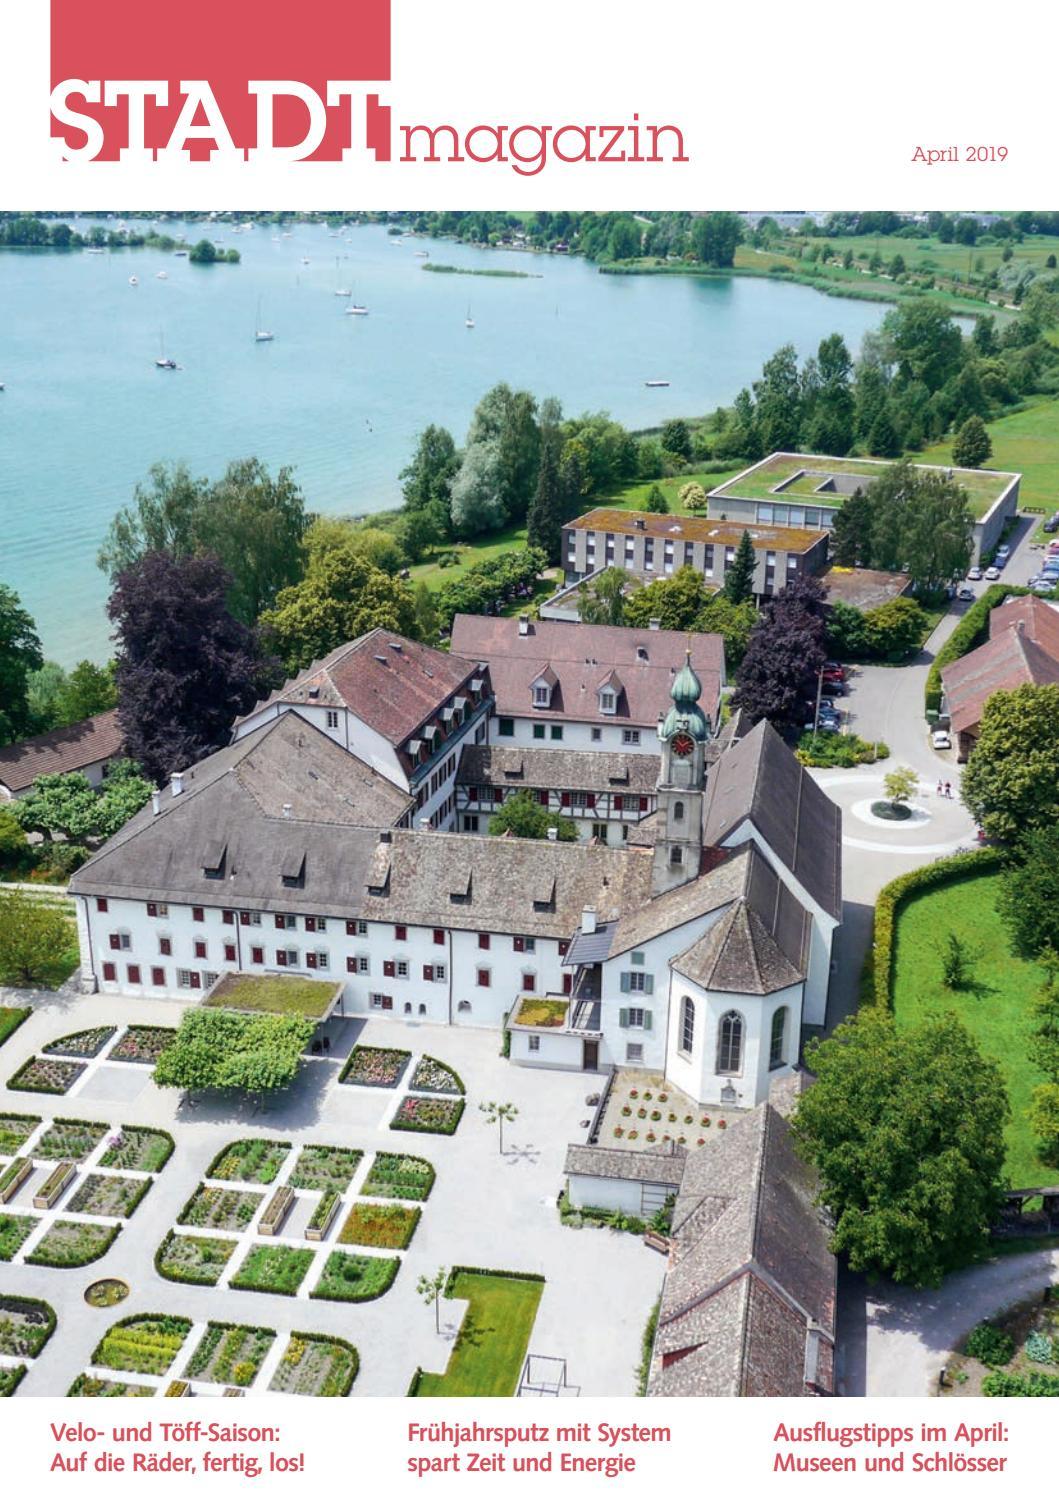 Partnersuche Schweiz: Partnervermittlung Angela & Marc